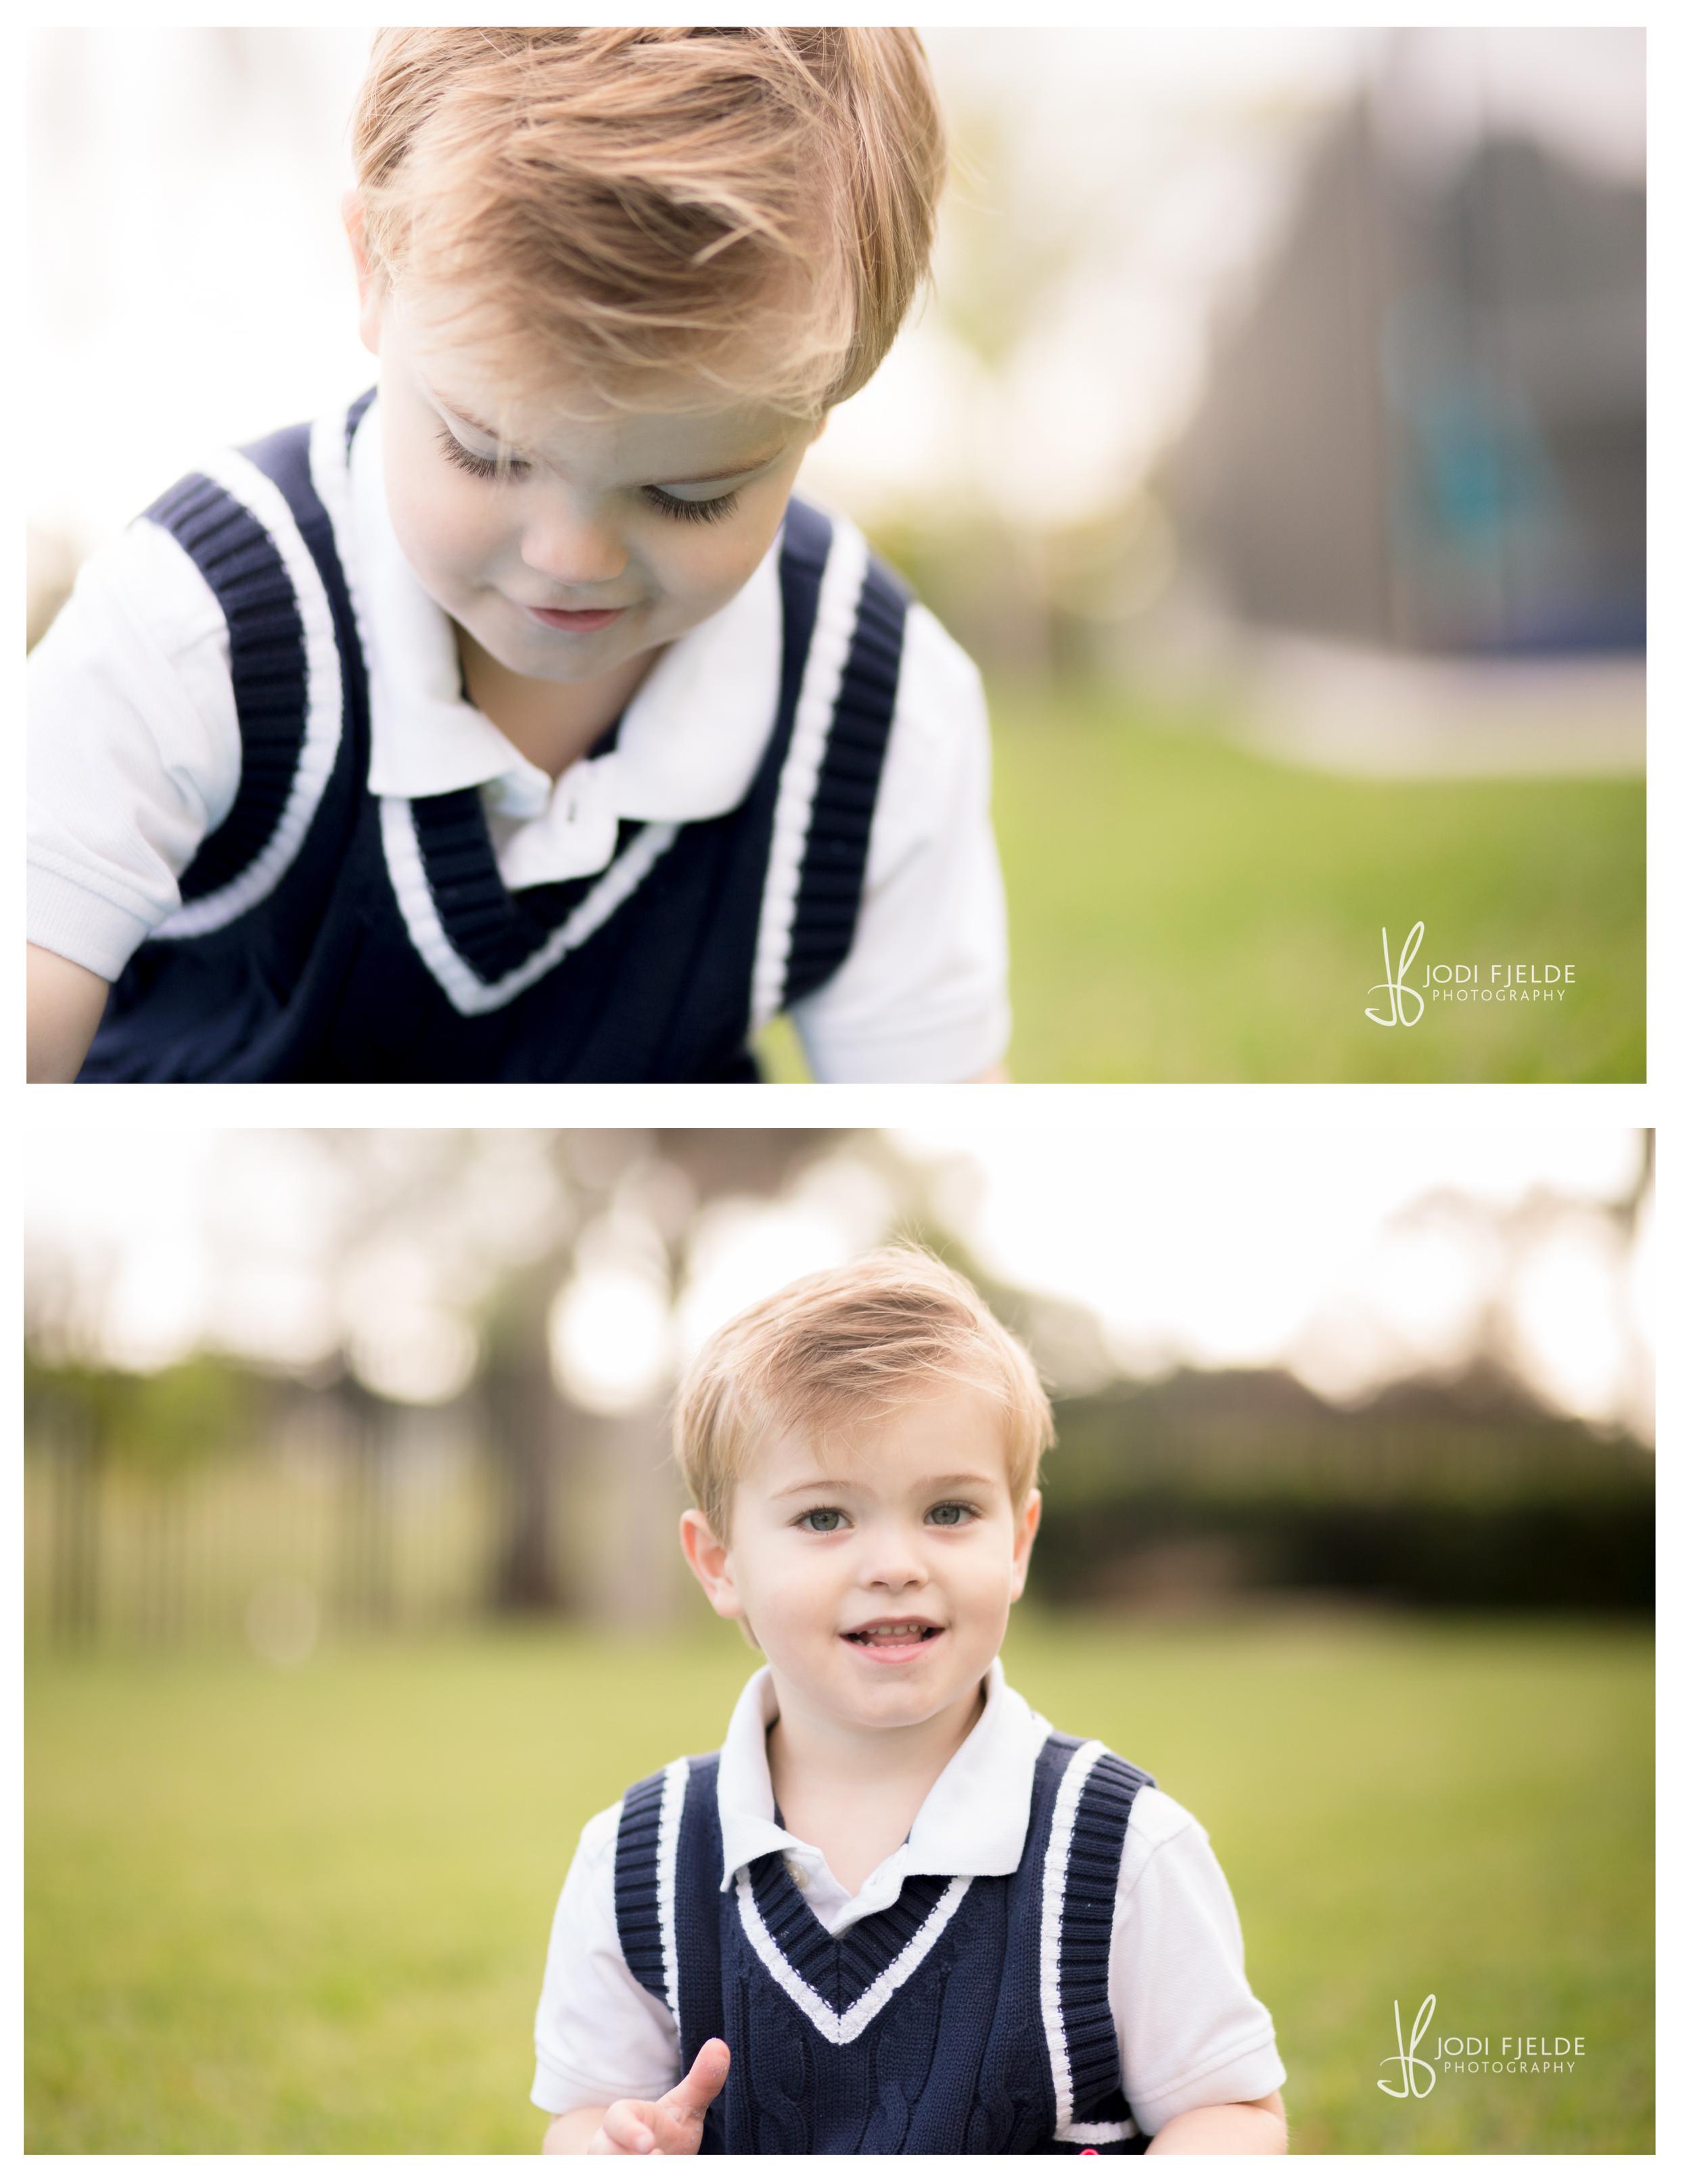 Boynton_Beach_Child_Photographer_Brady_Jodi_Fjelde_Photography 11.jpg